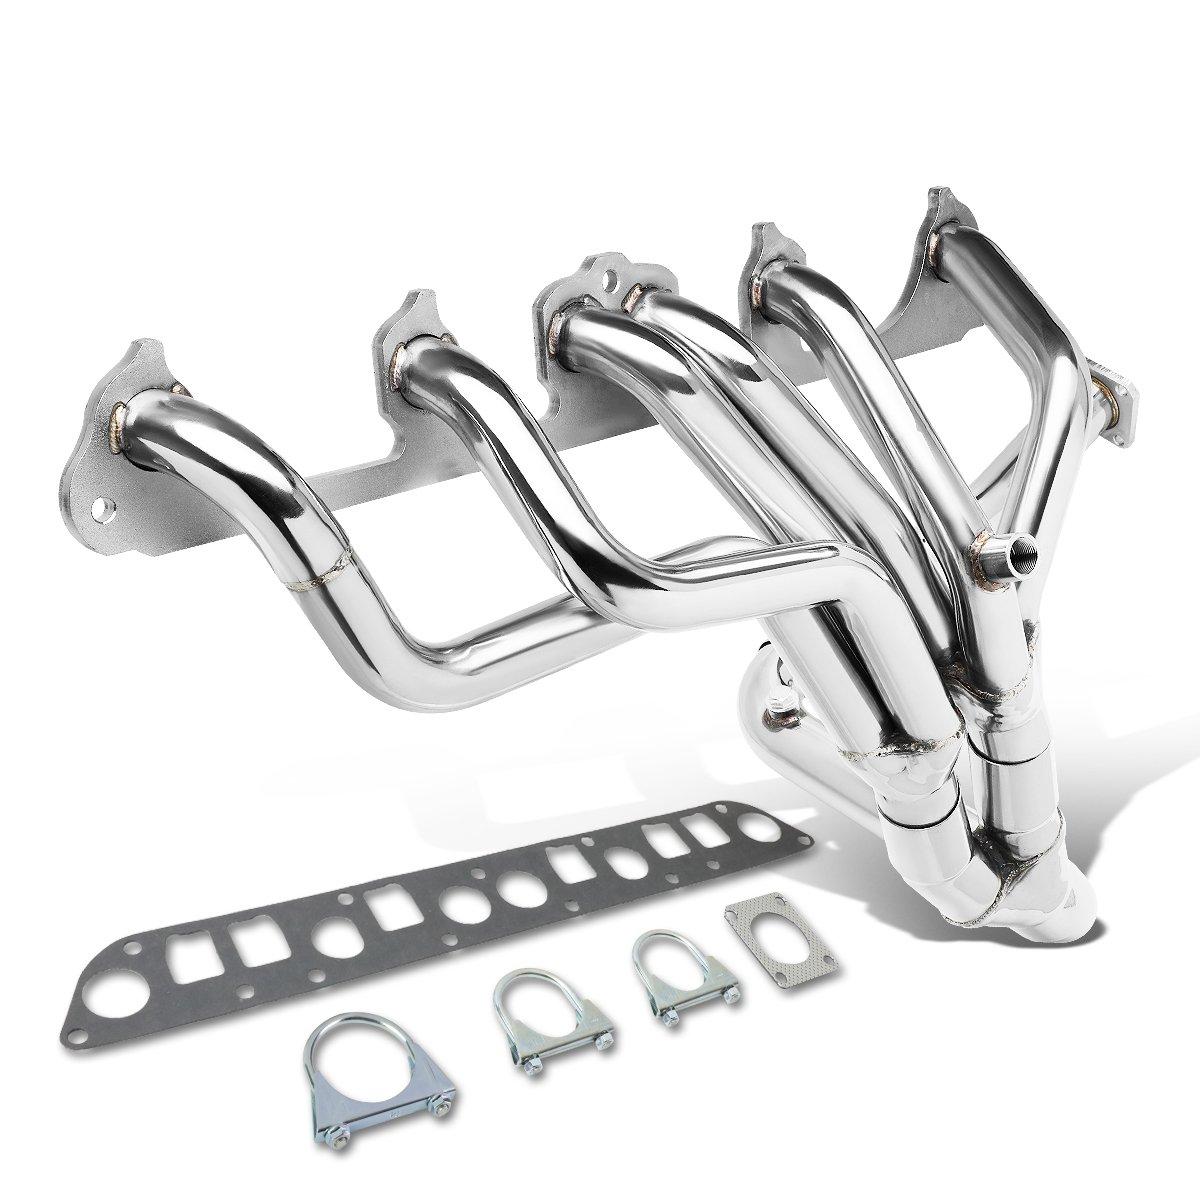 DNA Motoring HDS-T88-JCH87+Y Tri-Y Tubular Manifold Exhaust Header 87-93 Jeep Wagoneer